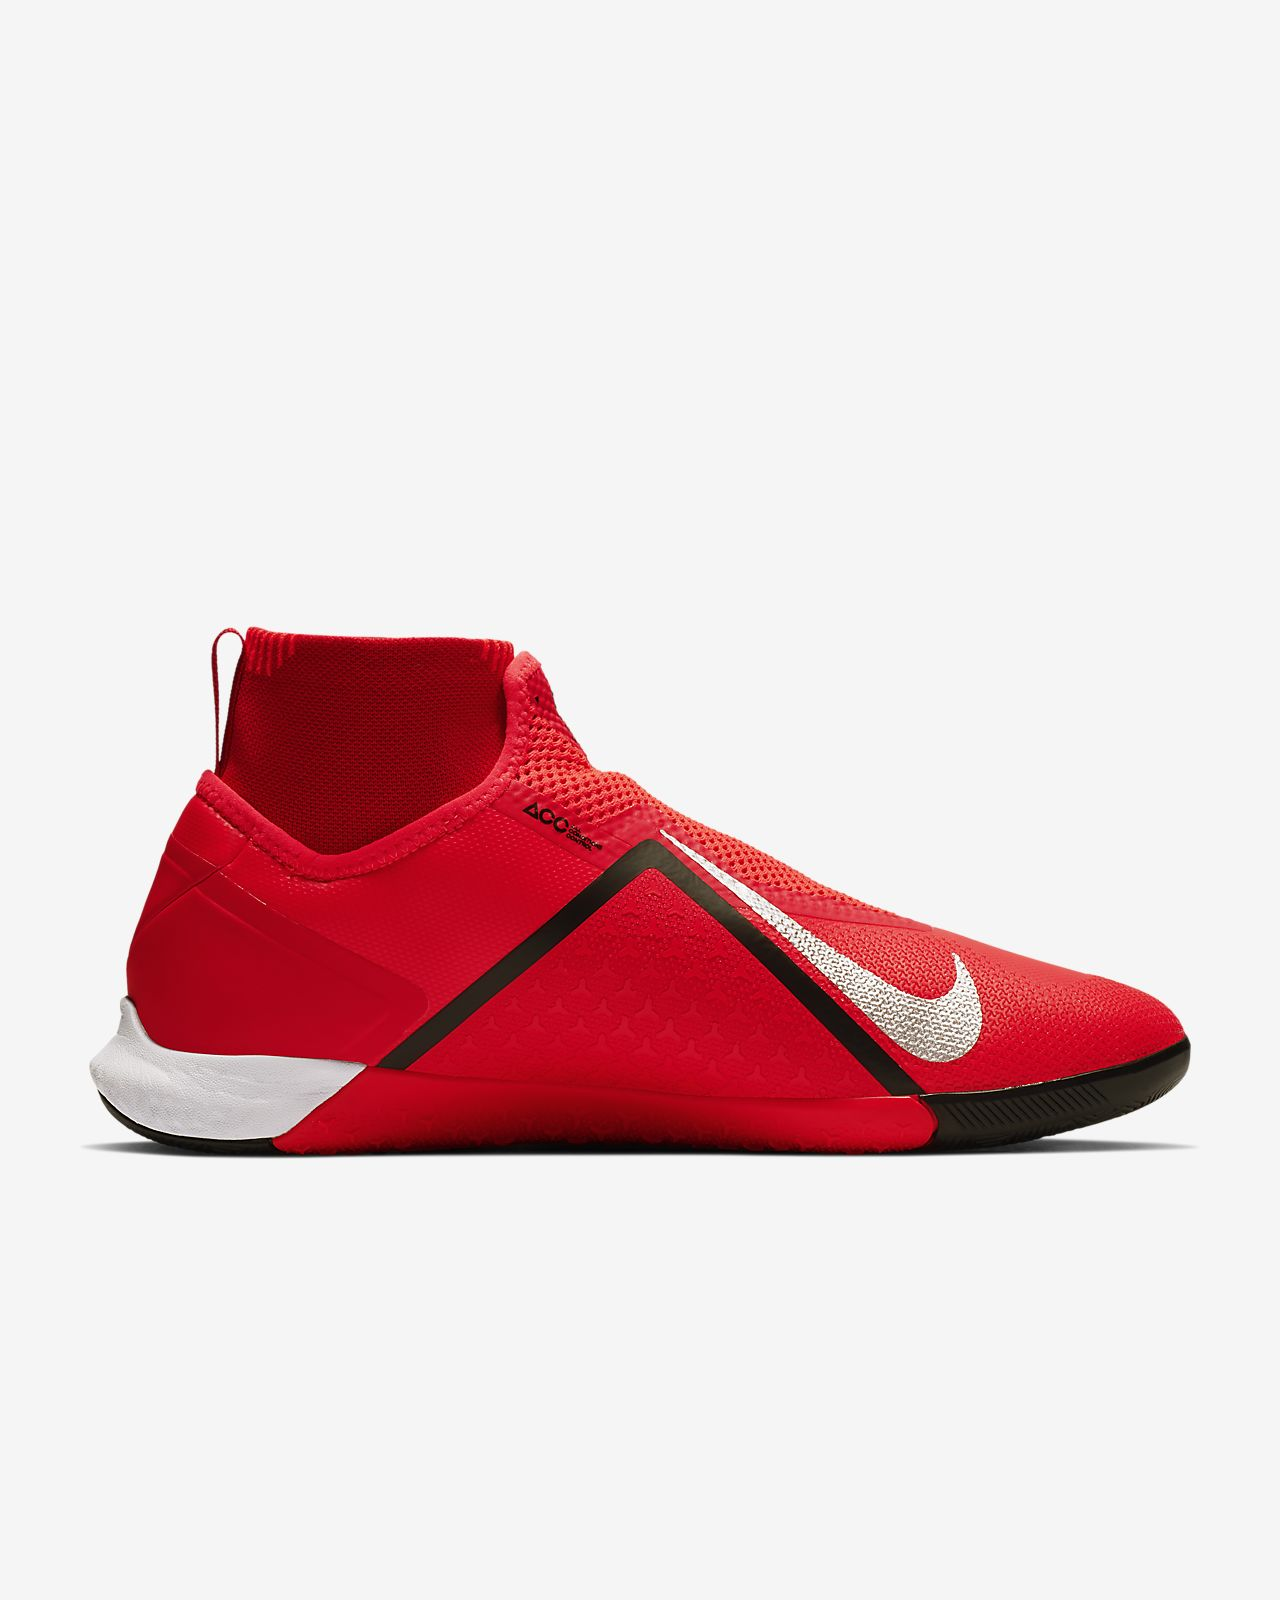 wholesale dealer 1db75 dfea5 ... Zaalvoetbalschoen Nike React PhantomVSN Pro Dynamic Fit Game Over IC  Zaalvoetbalschoen